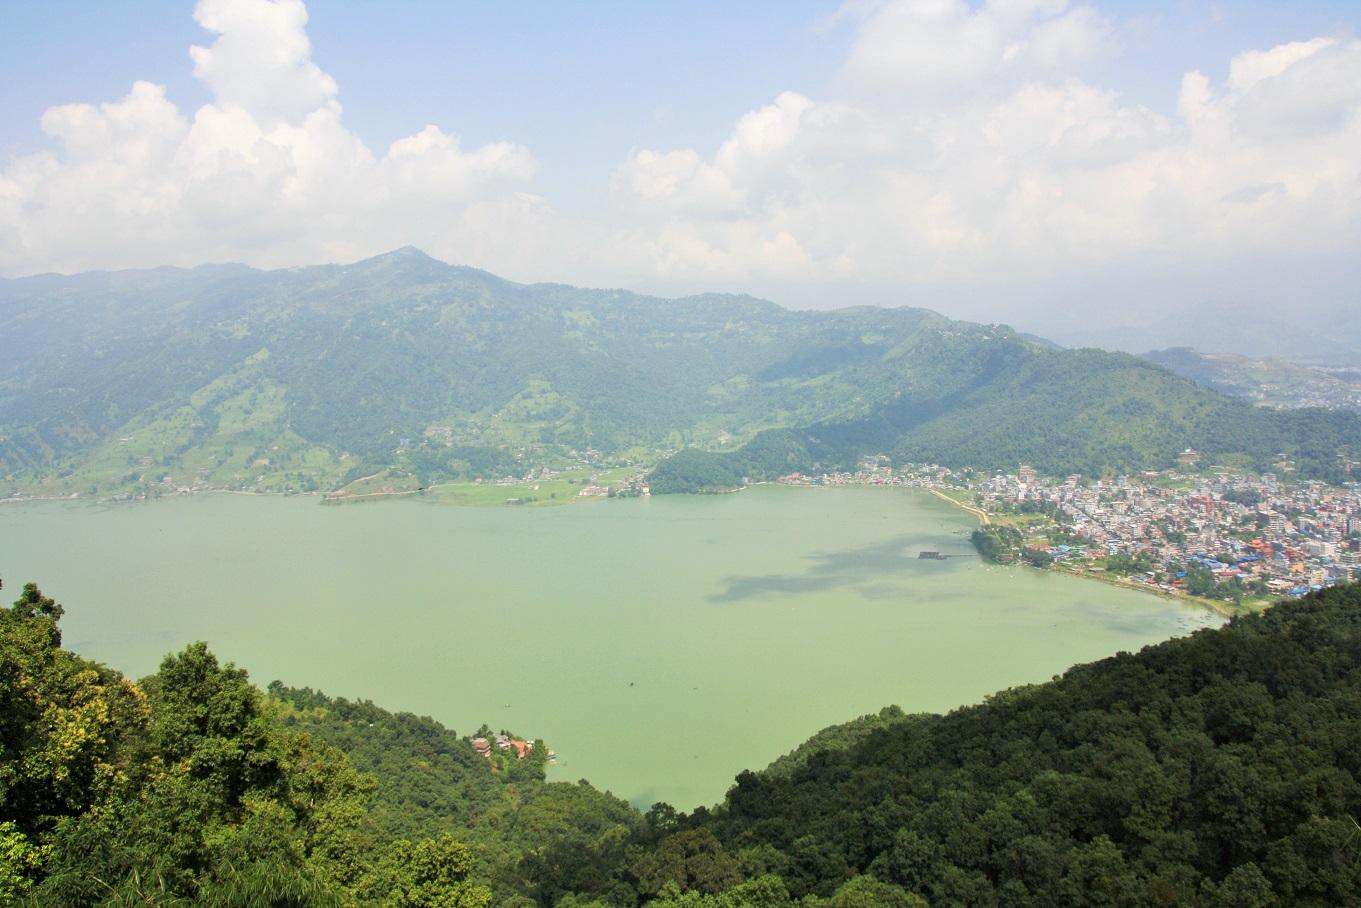 Uitzicht op Pokhara en Phewa Lake